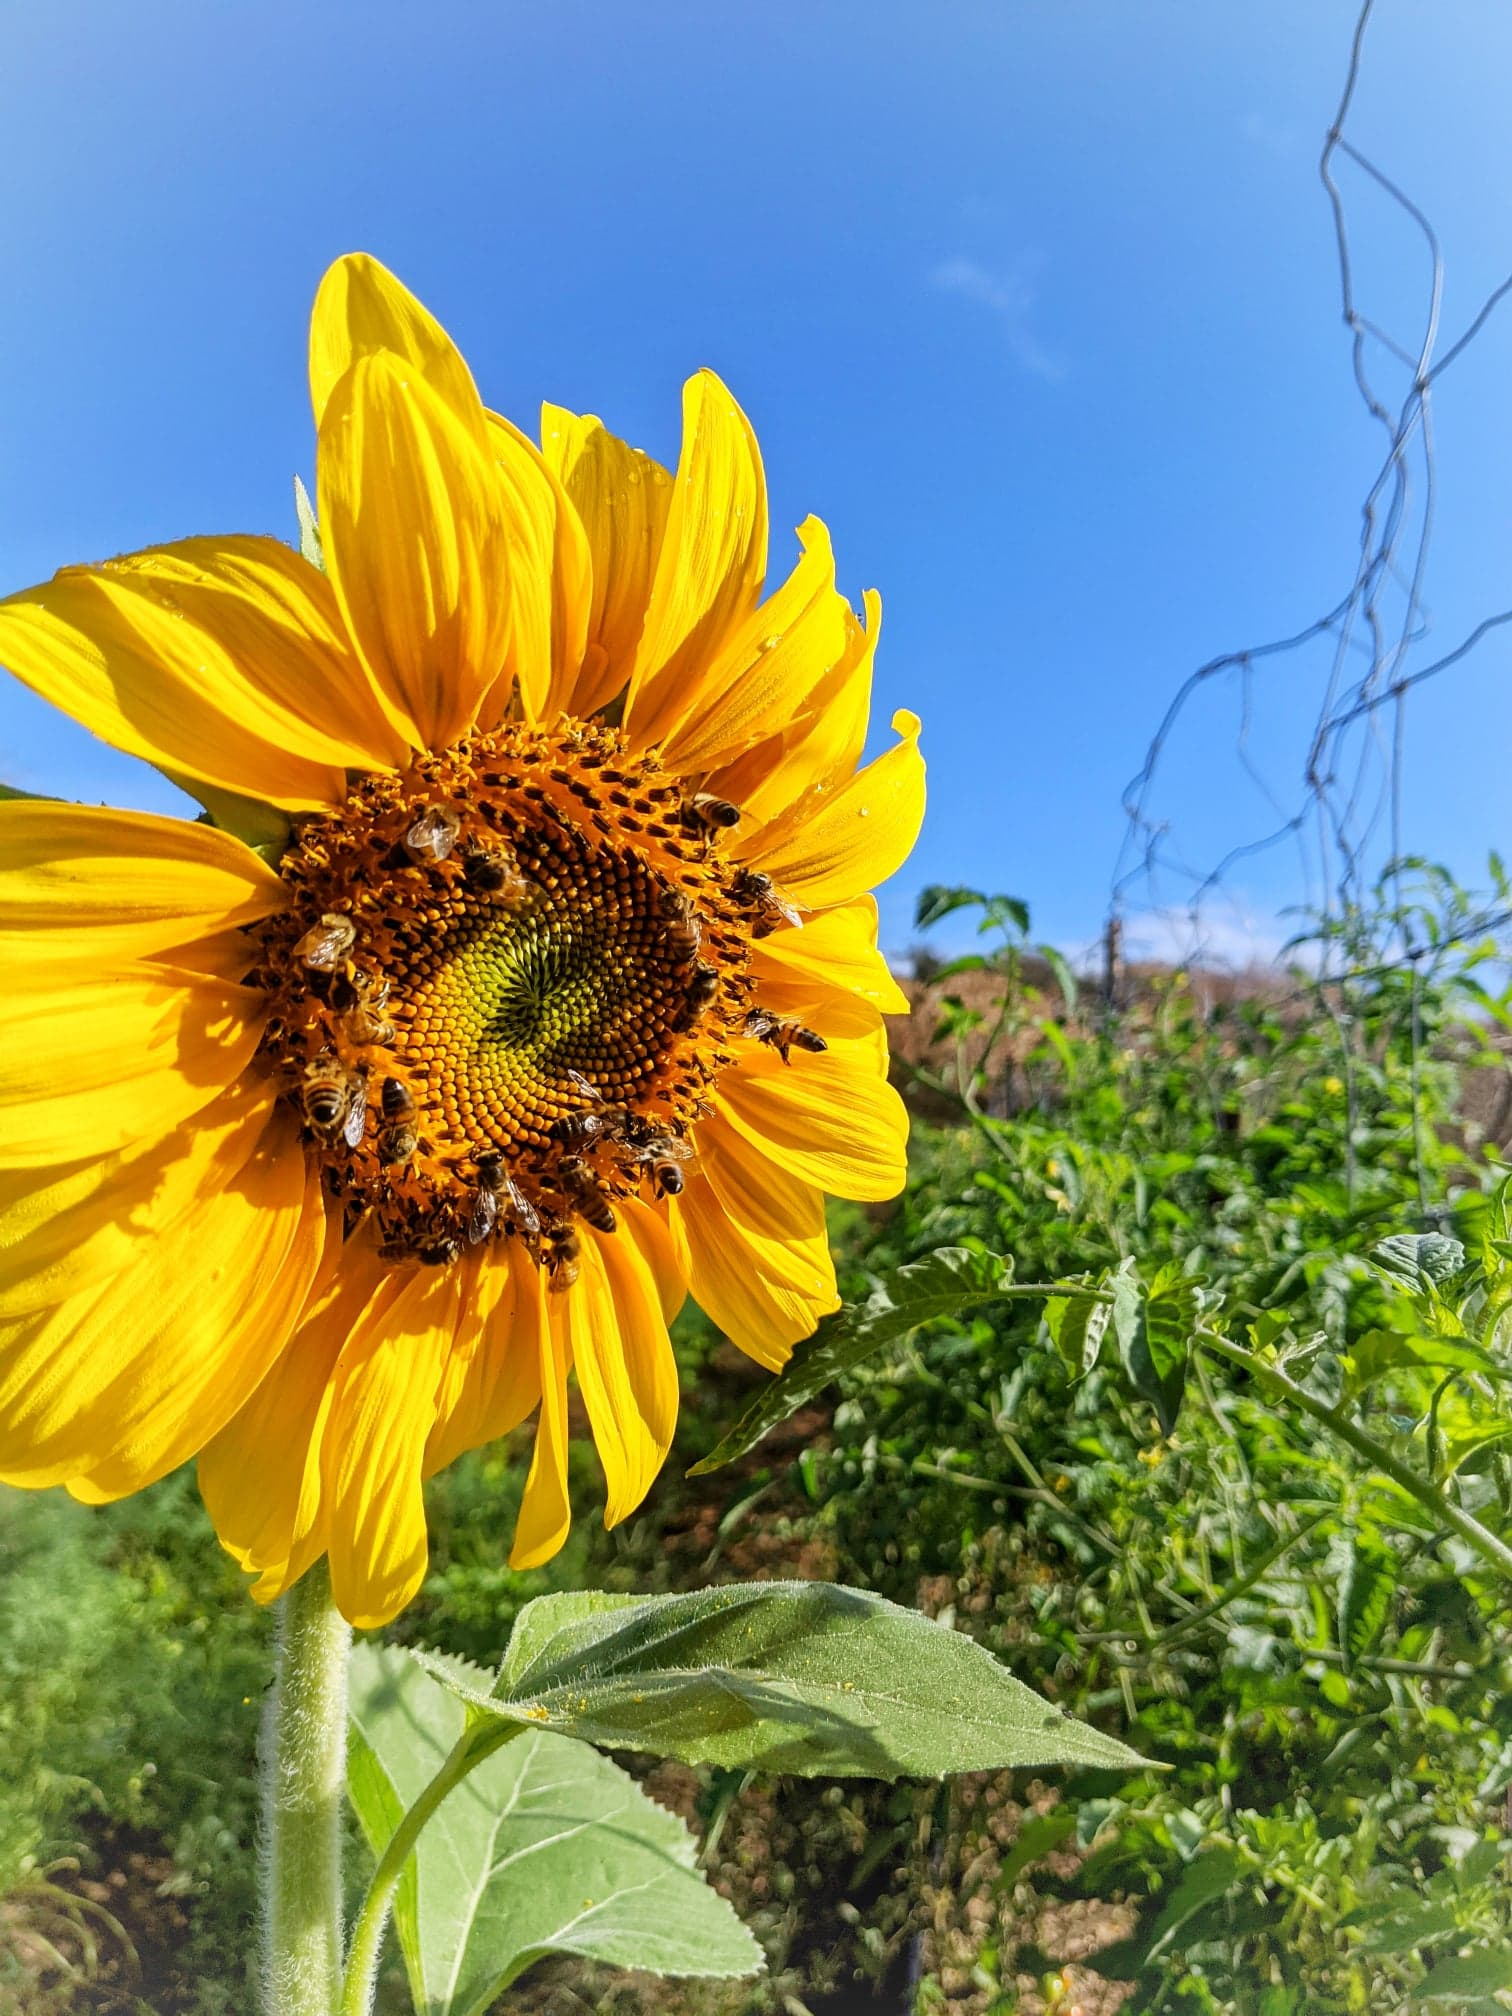 Happy bees means happy farm